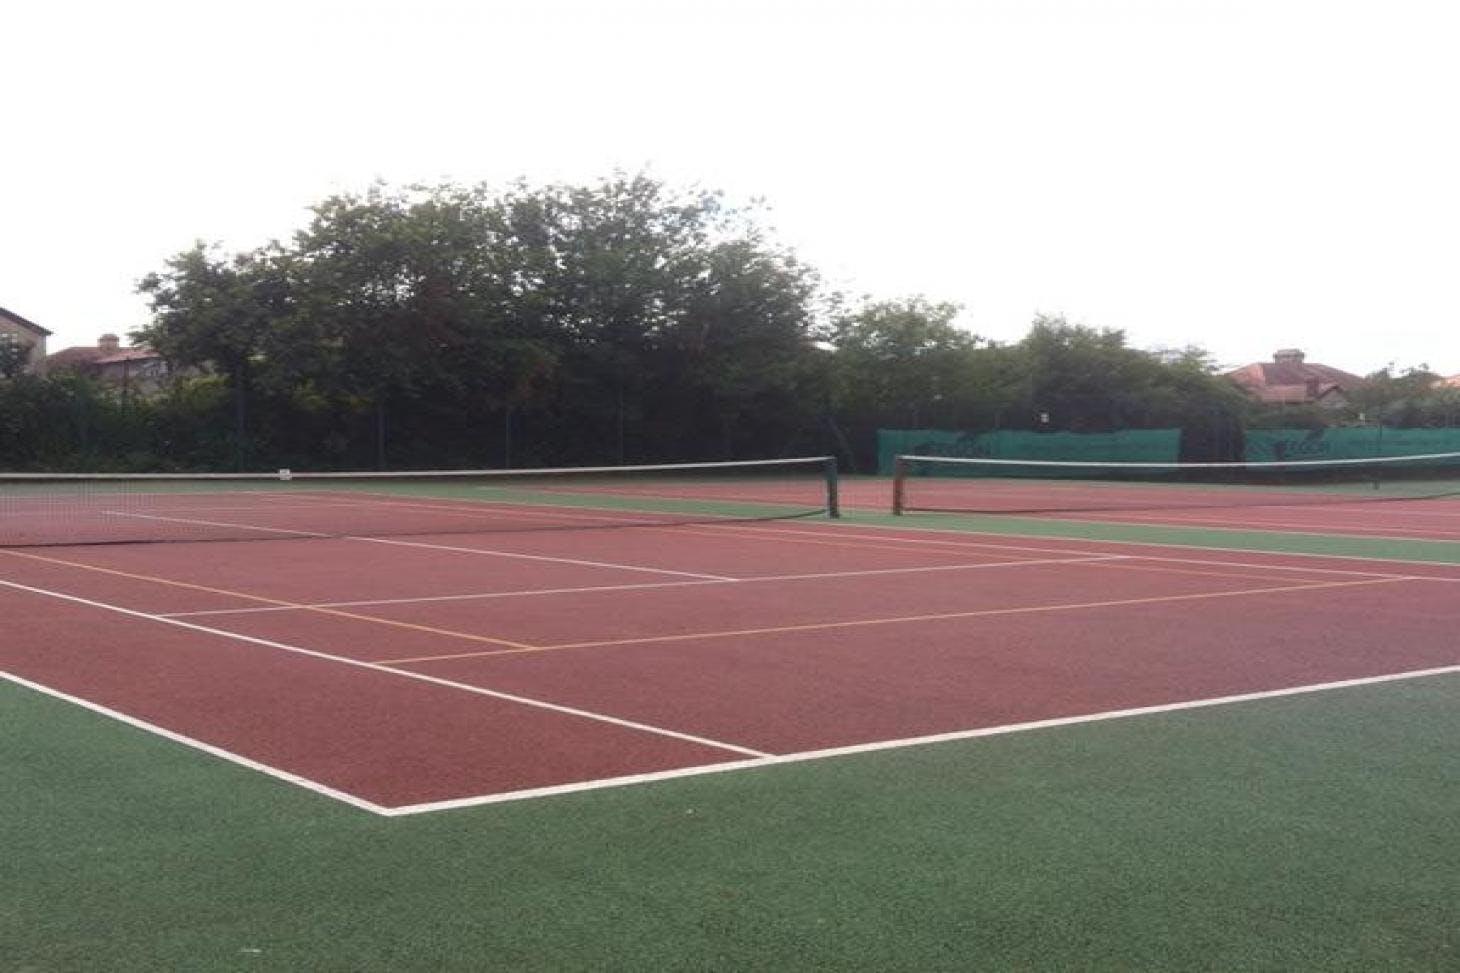 Croydon Road Recreation Ground Outdoor | Hard (macadam) tennis court